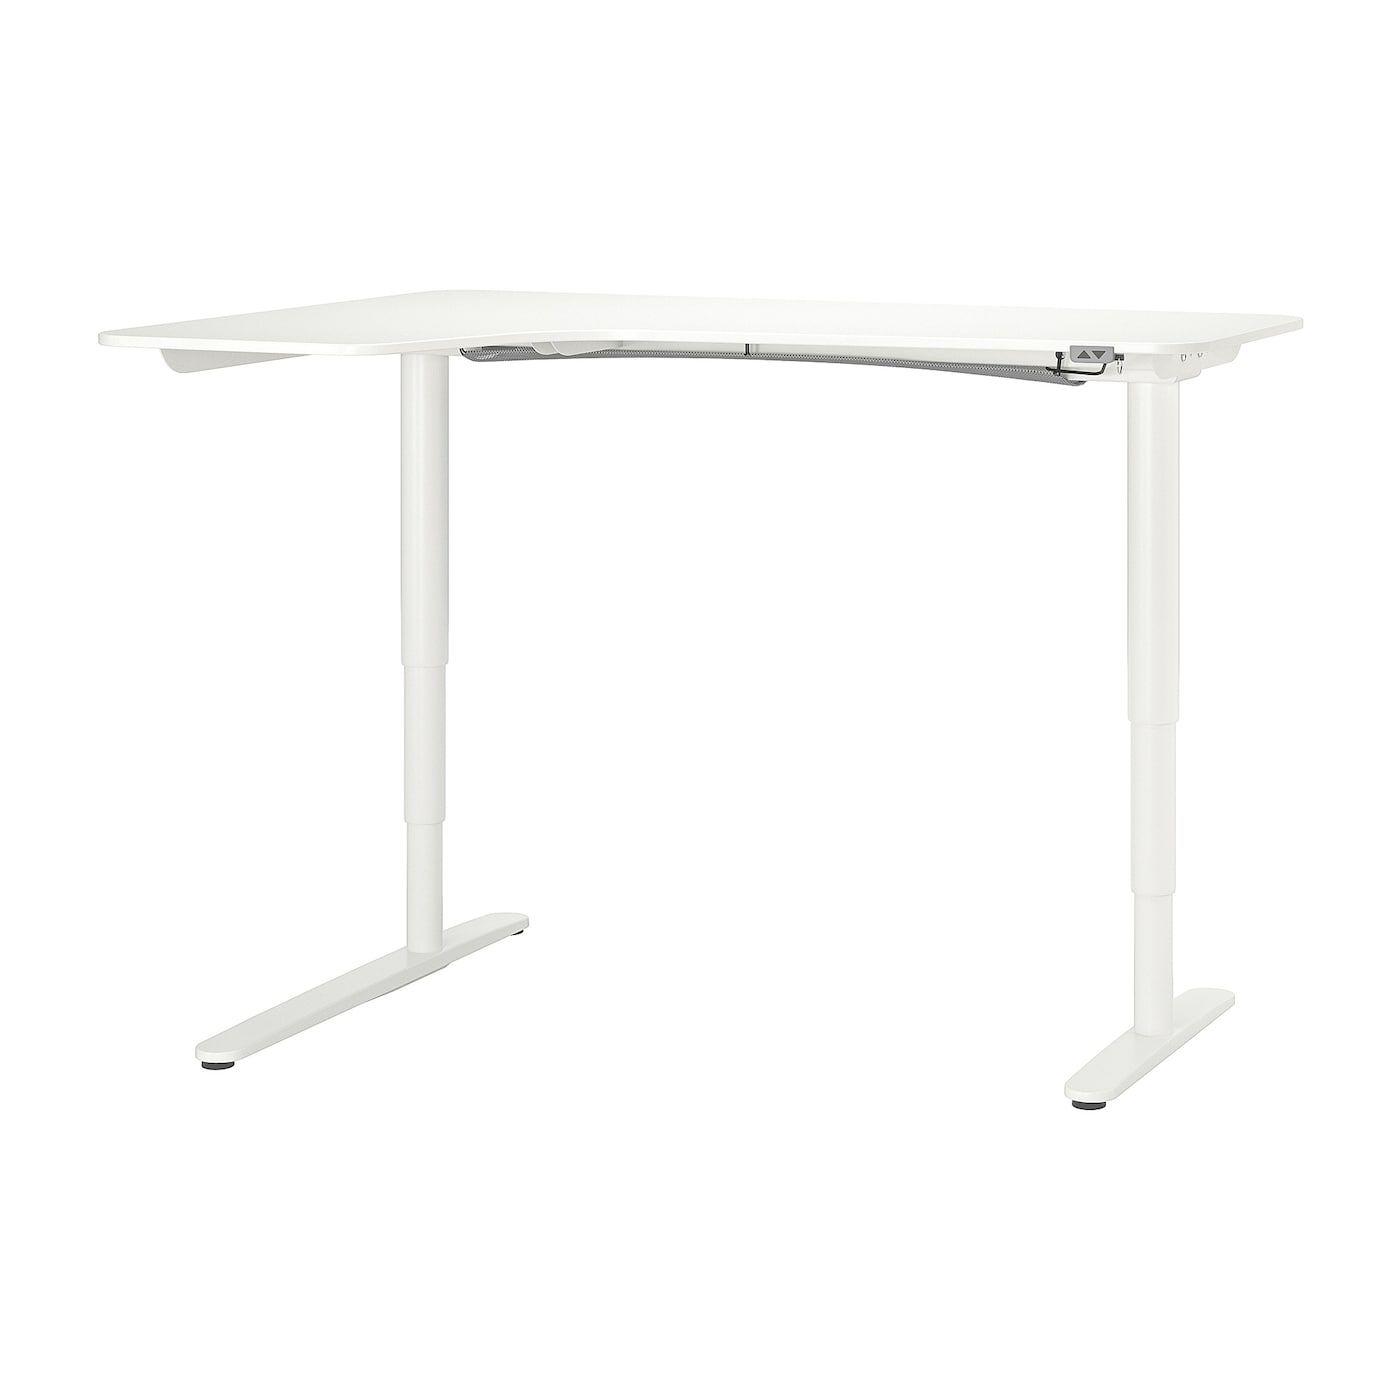 Ikea Bekant Corner Desk Left Sit Stand White Corner Desk White Corner Desk Ikea Bekant